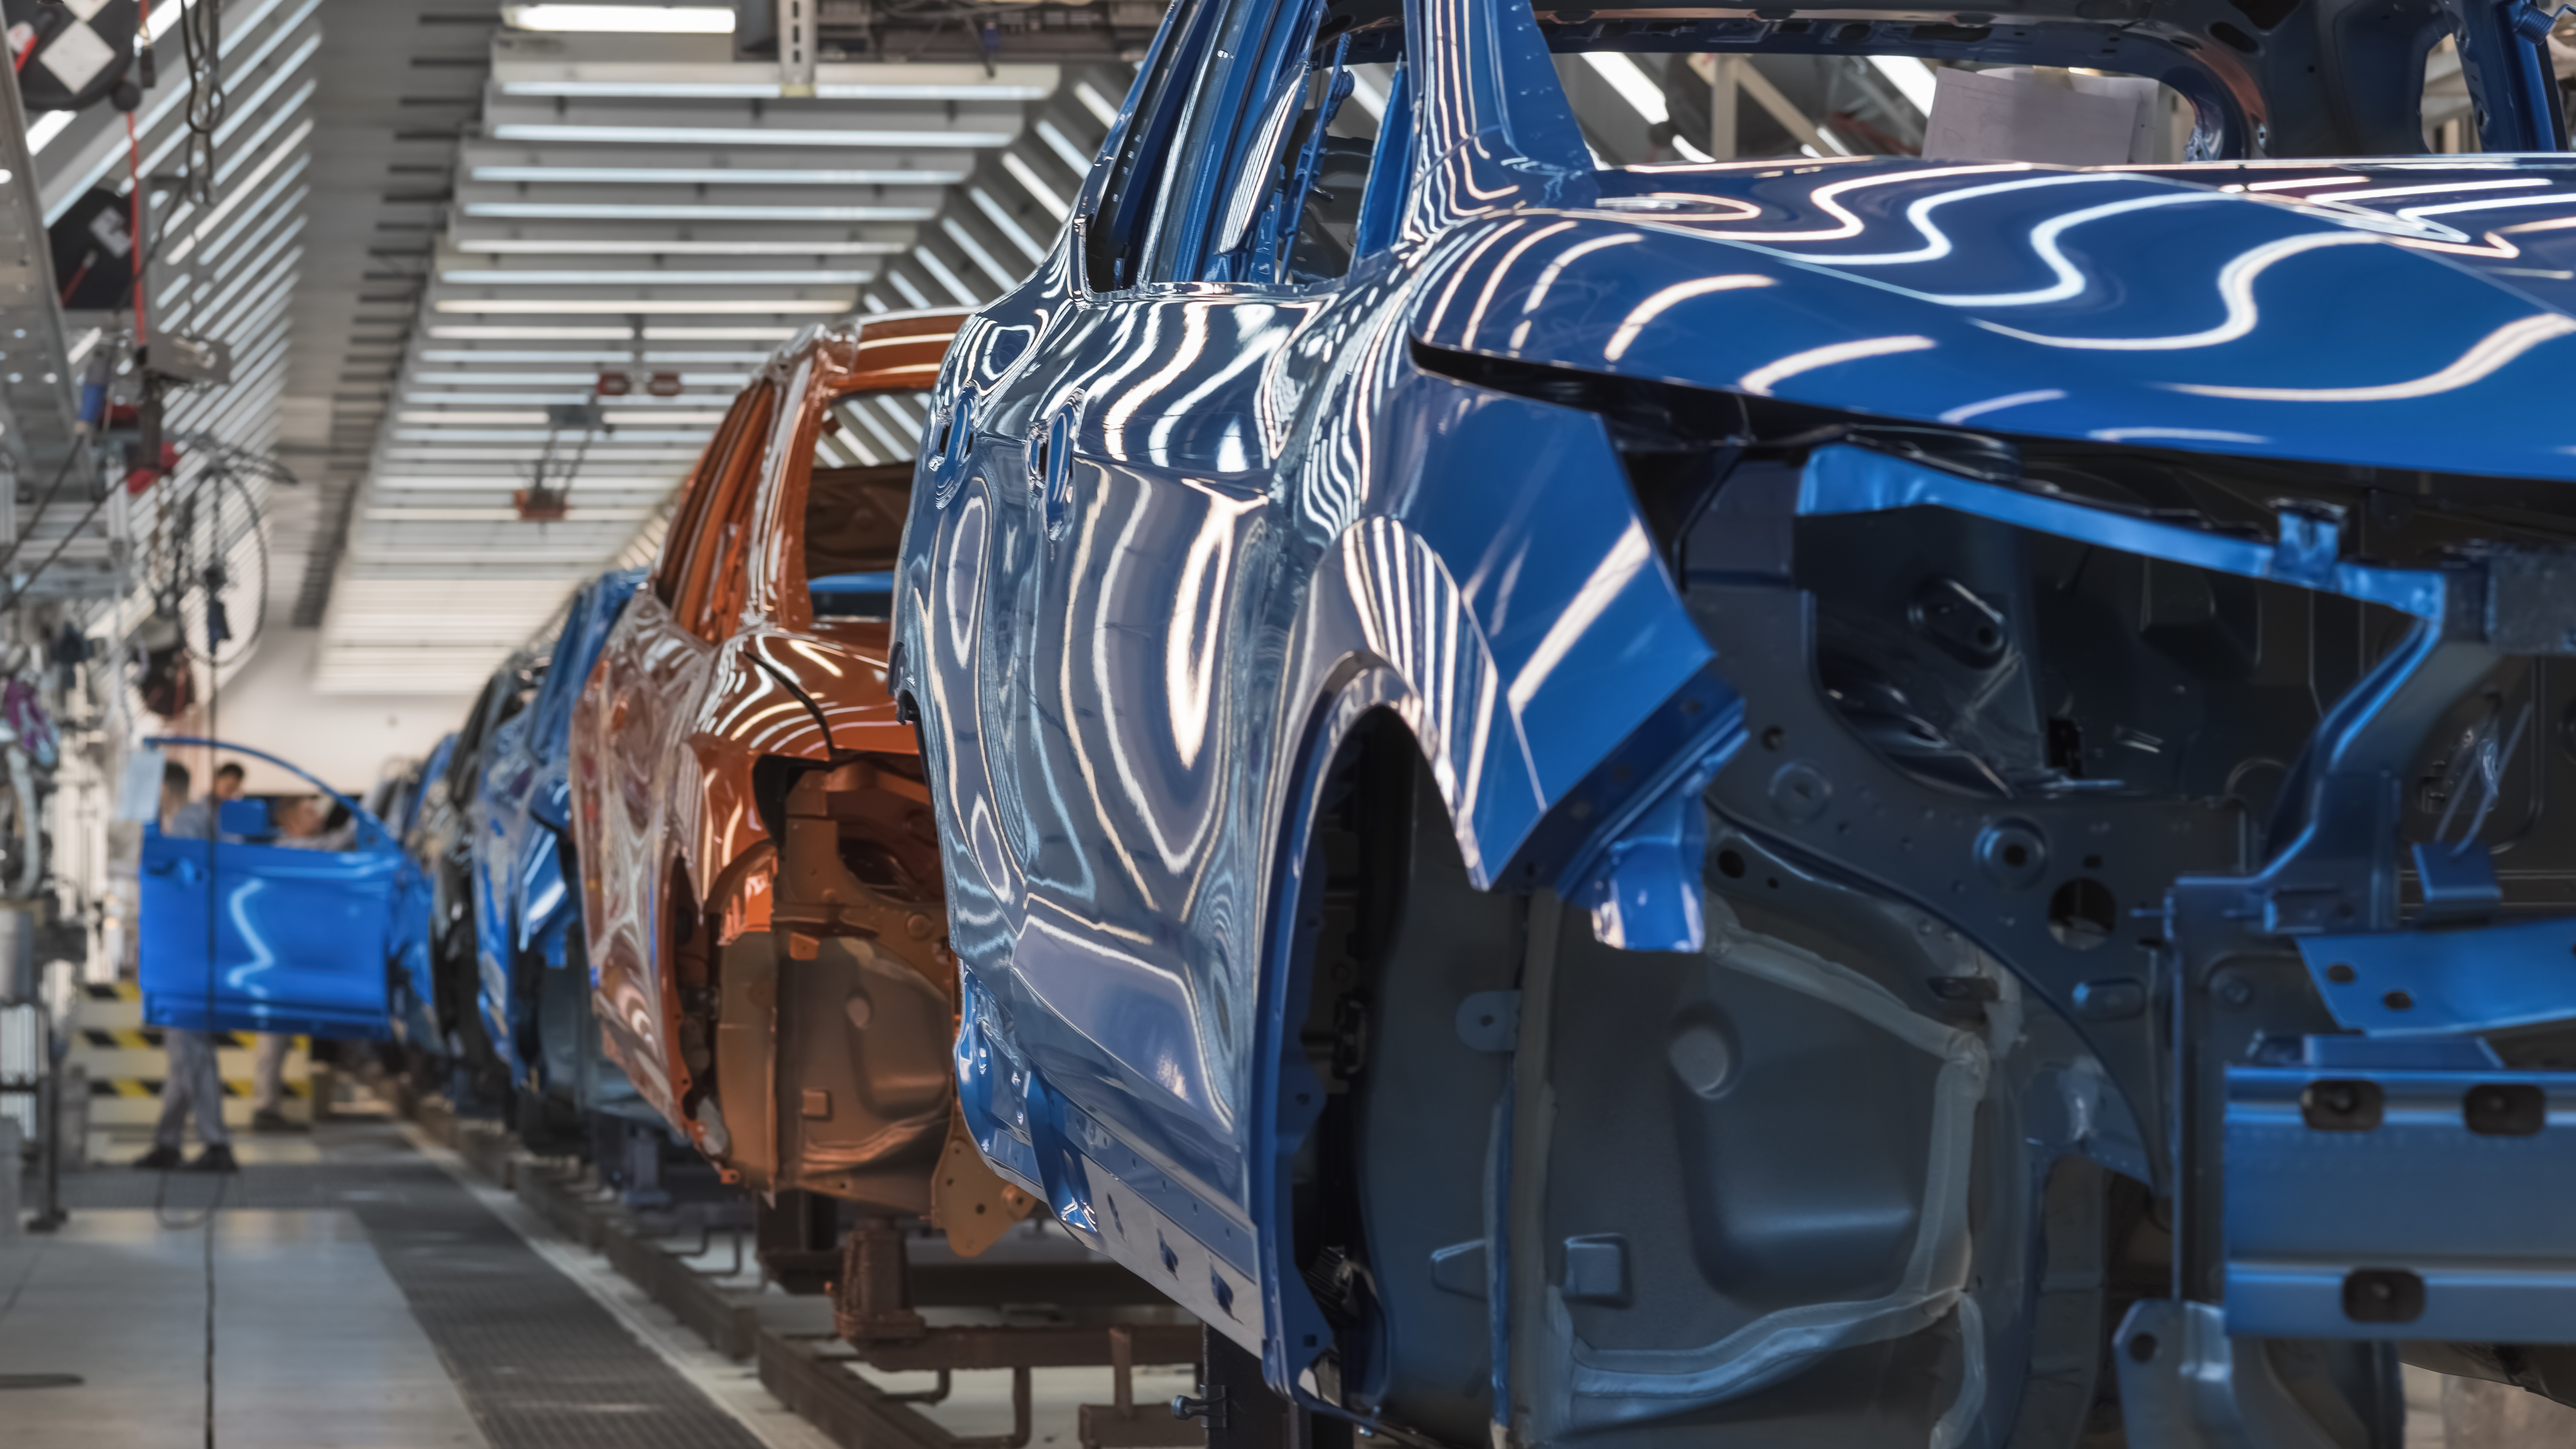 U.S. Auto Loses $108 Billion Between March And April 2020